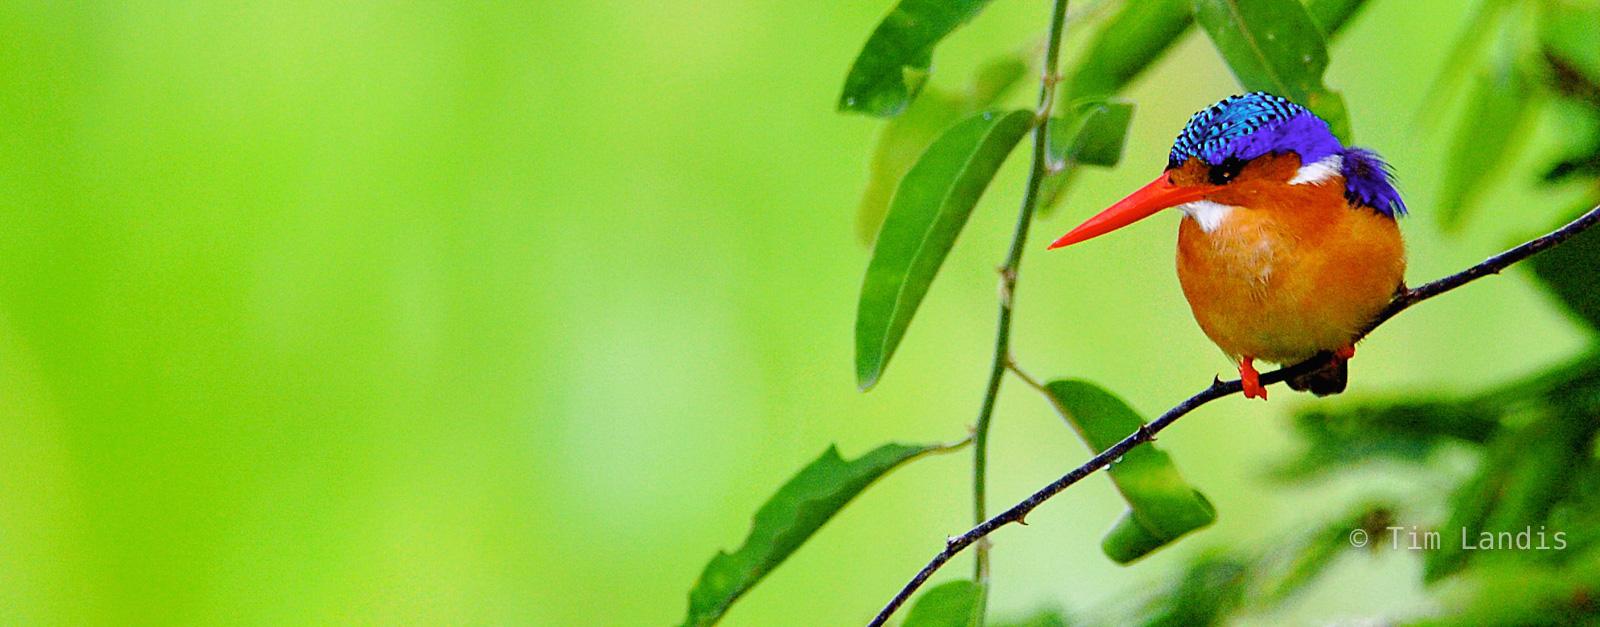 Malachite Kingfisher, african birds, birds, photo